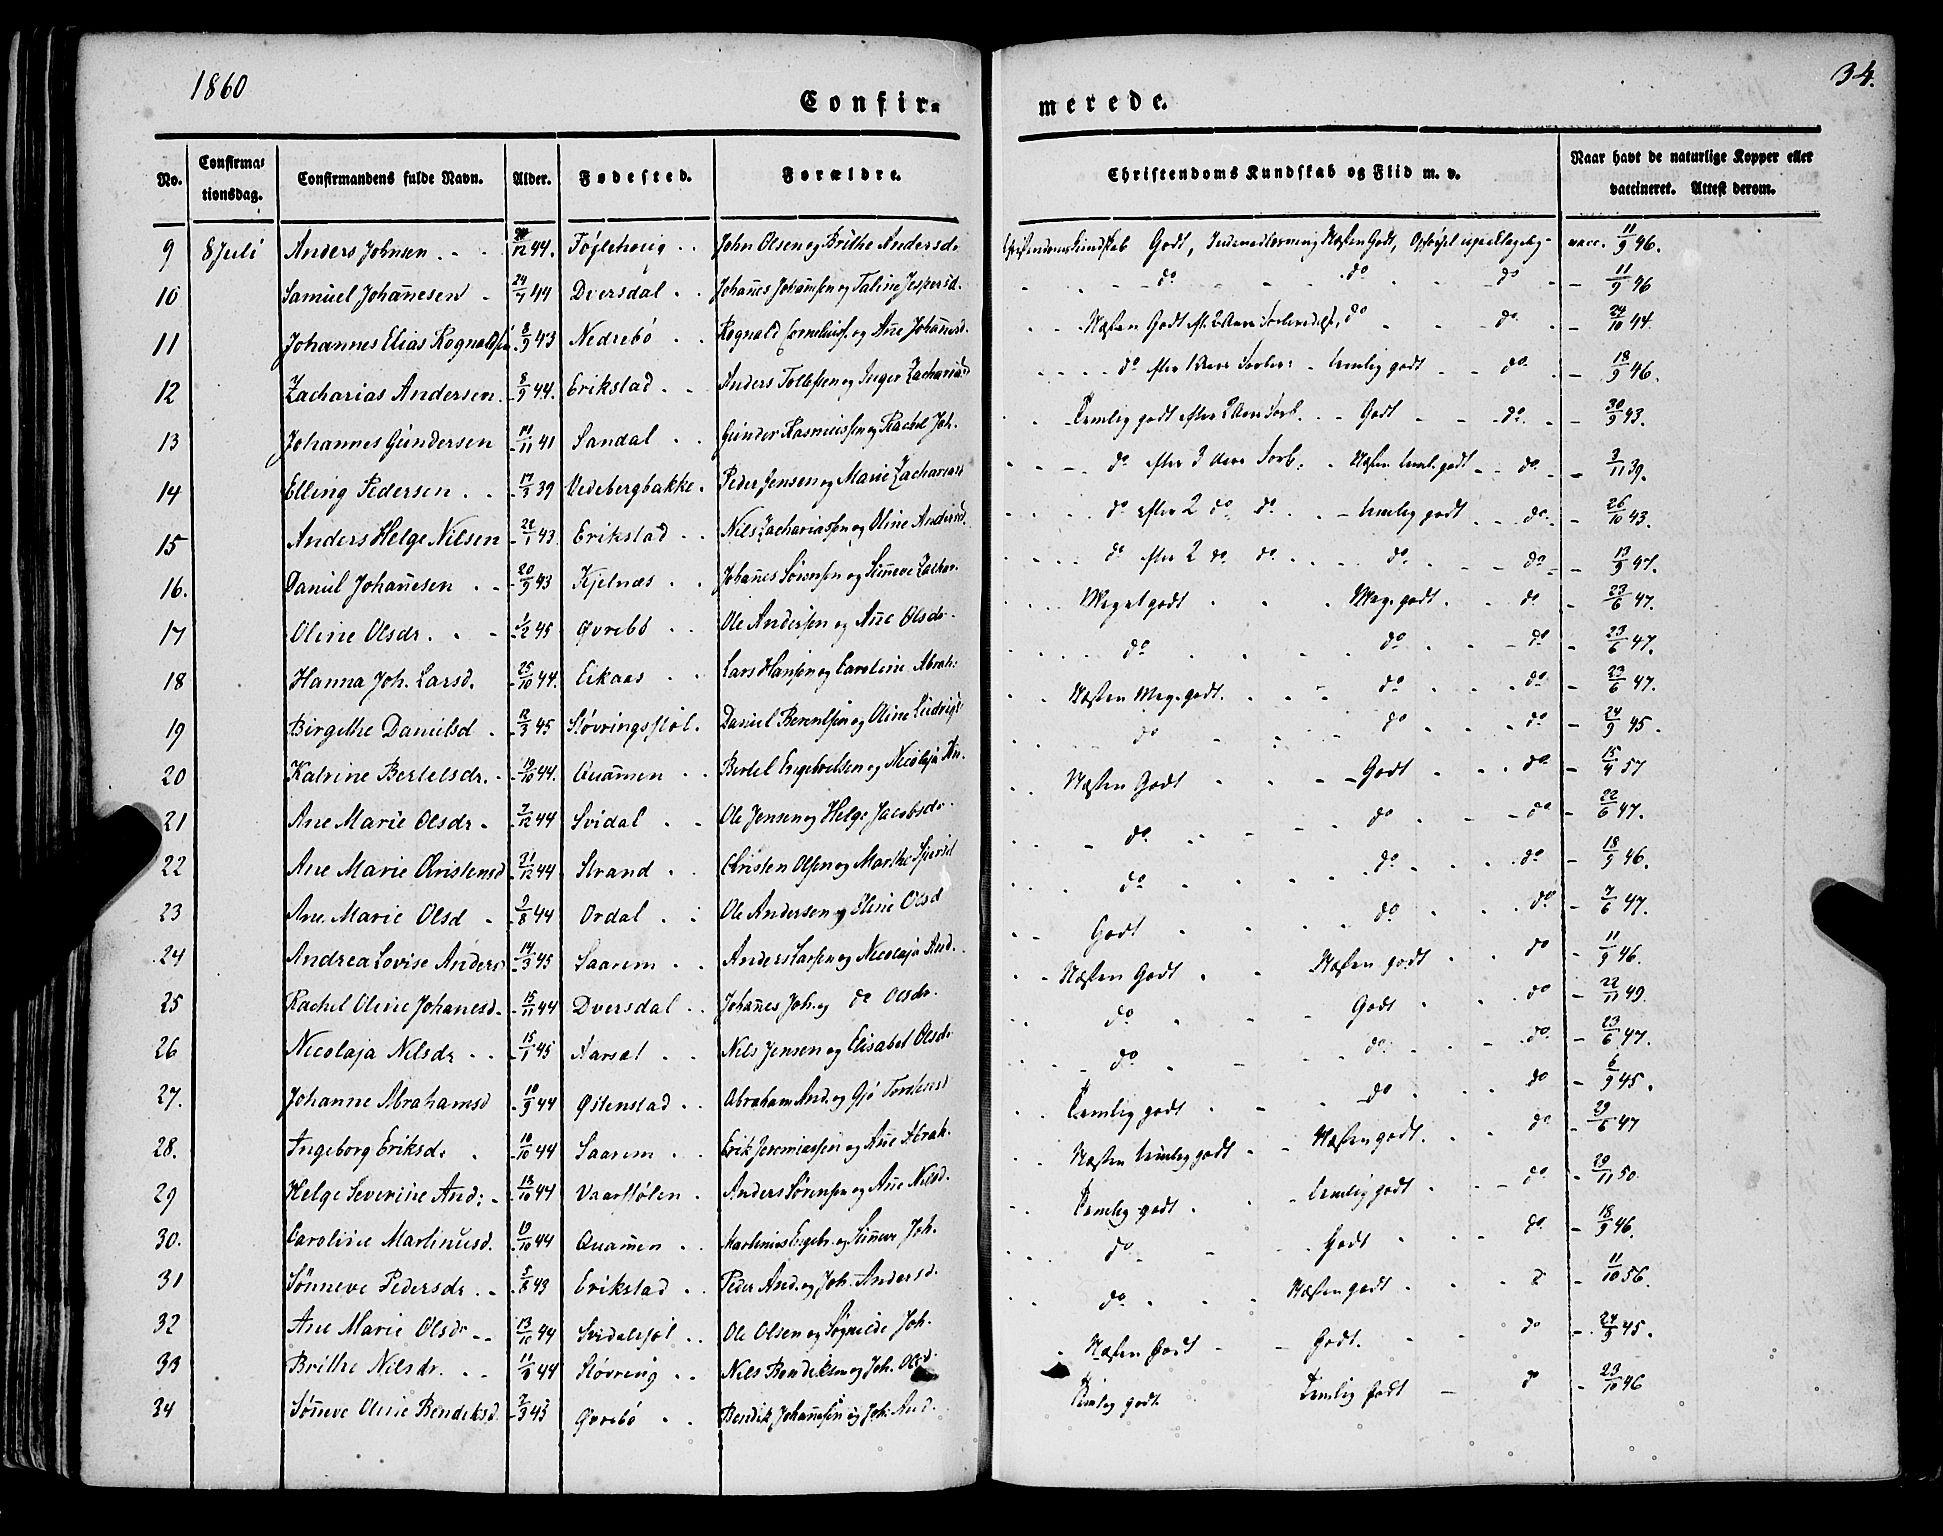 SAB, Jølster sokneprestembete, H/Haa/Haaa/L0010: Parish register (official) no. A 10, 1847-1865, p. 34